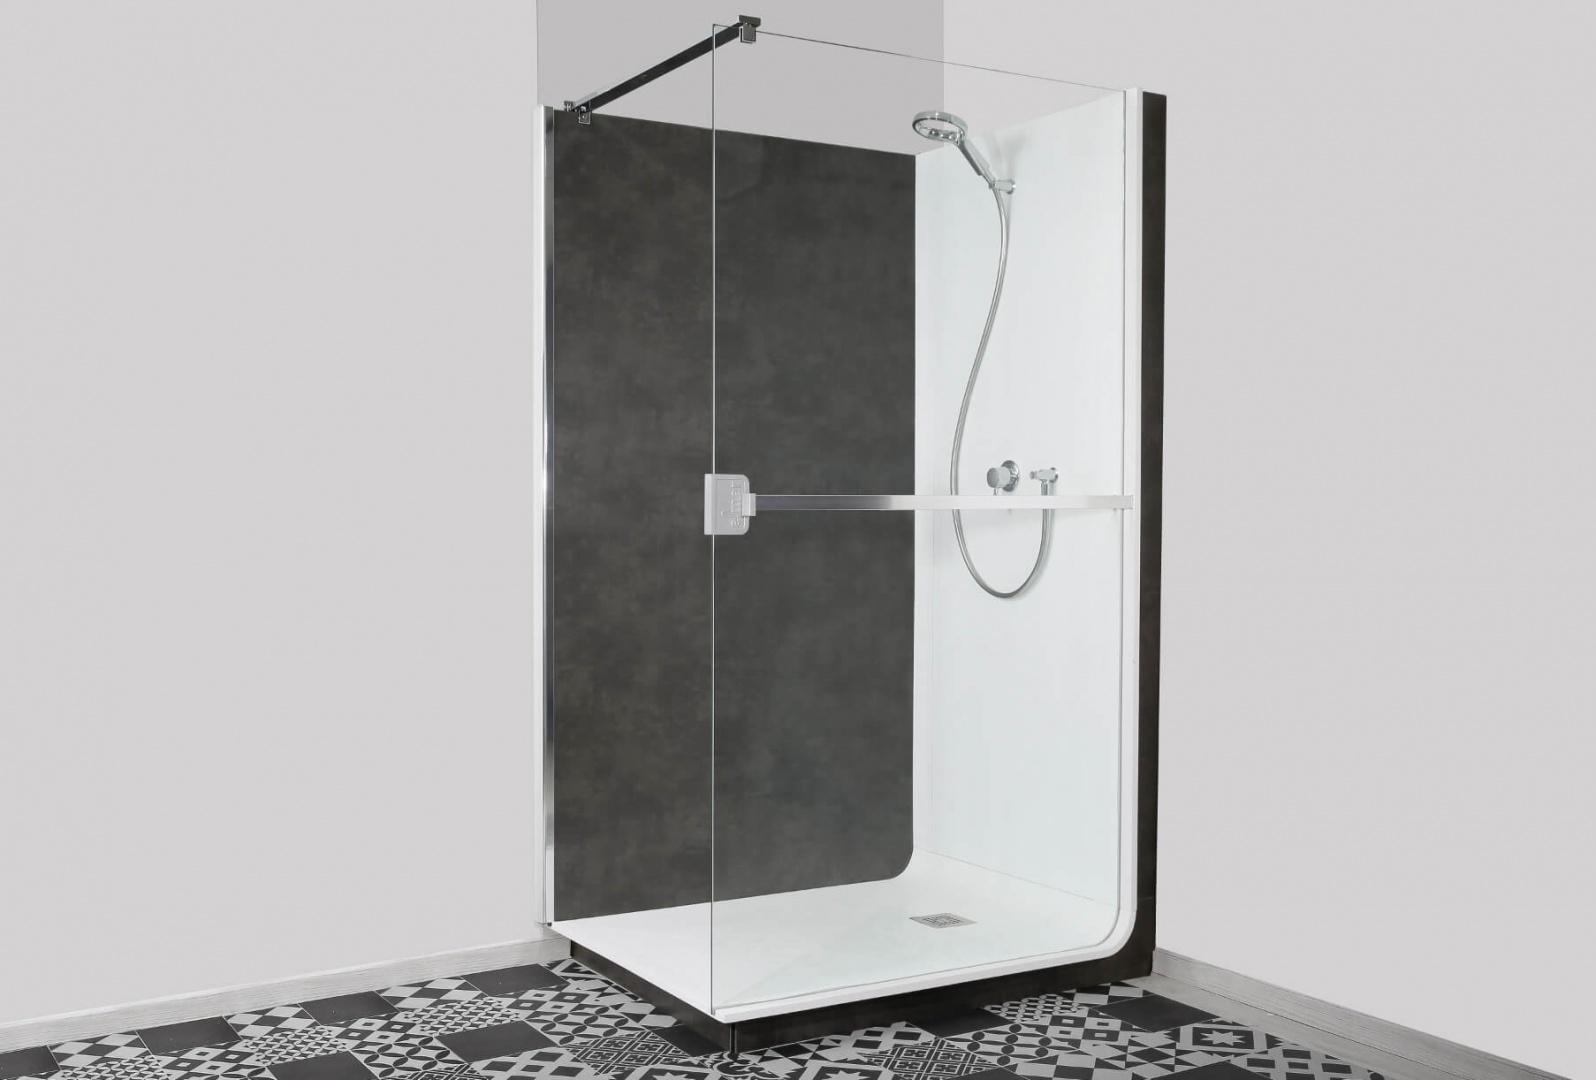 douche originale douche italienne elmer. Black Bedroom Furniture Sets. Home Design Ideas